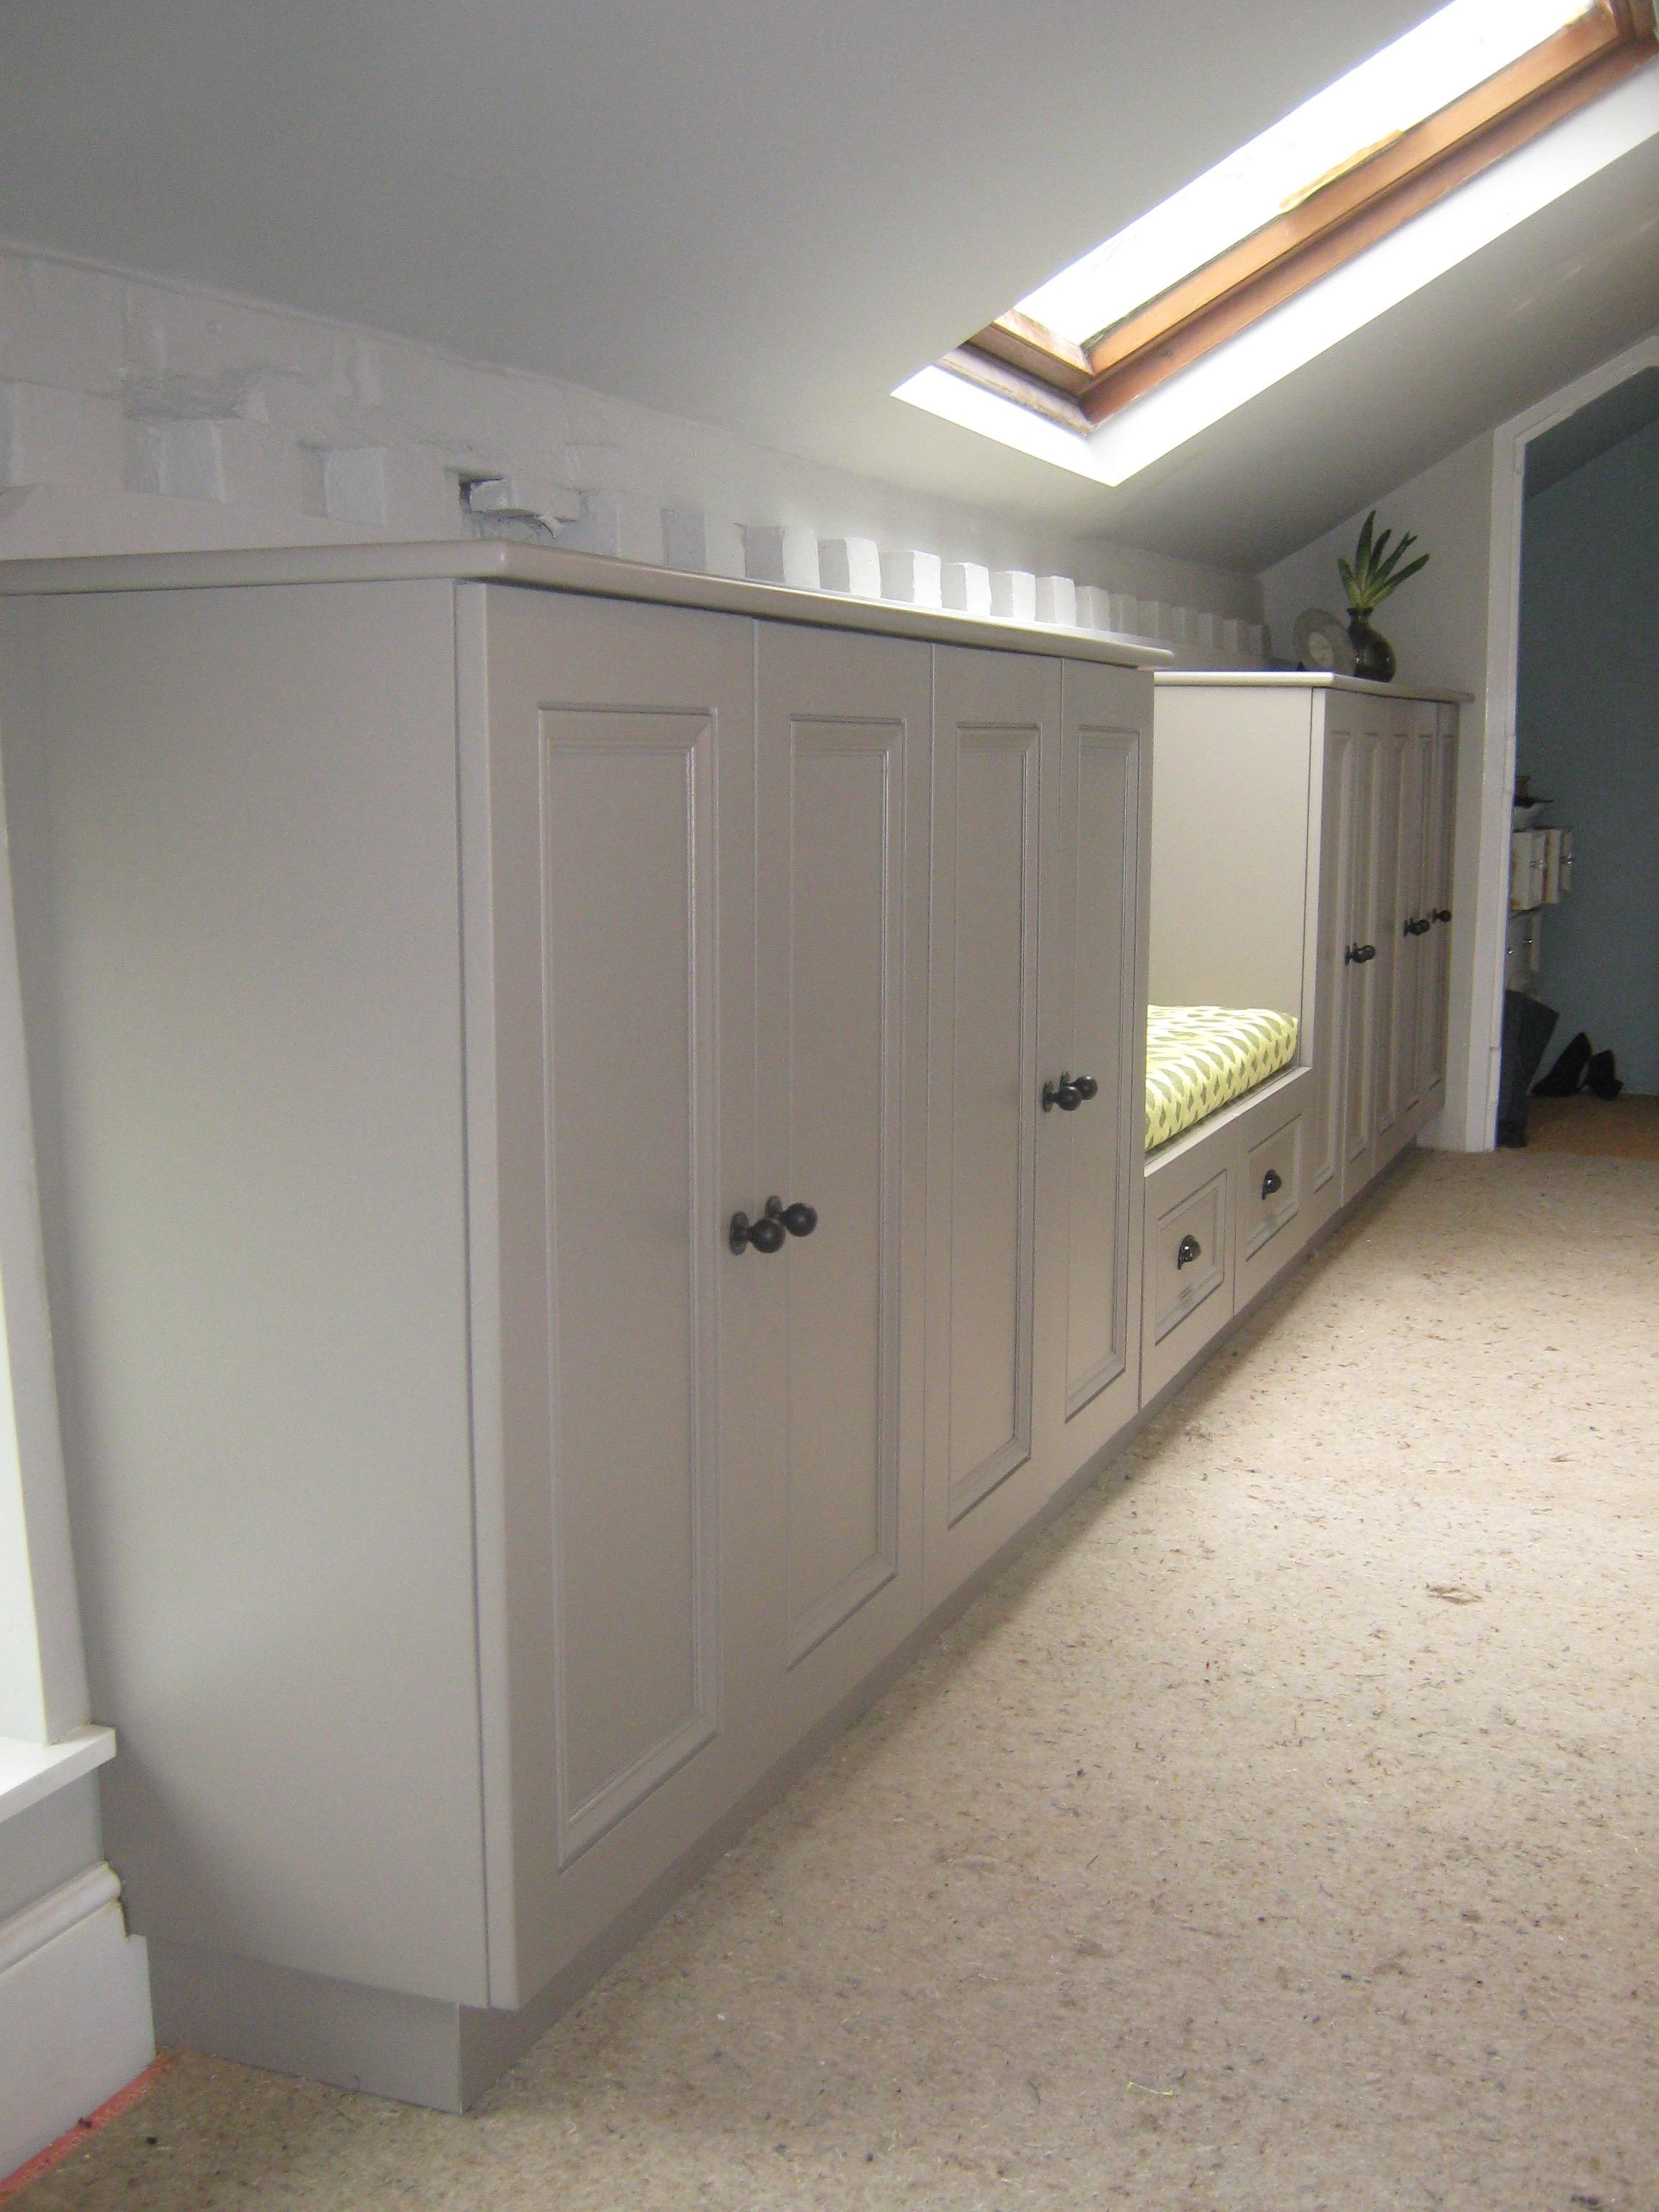 Painted Hallway Storage Ideas Cabinets Hallway Seat Window Seat